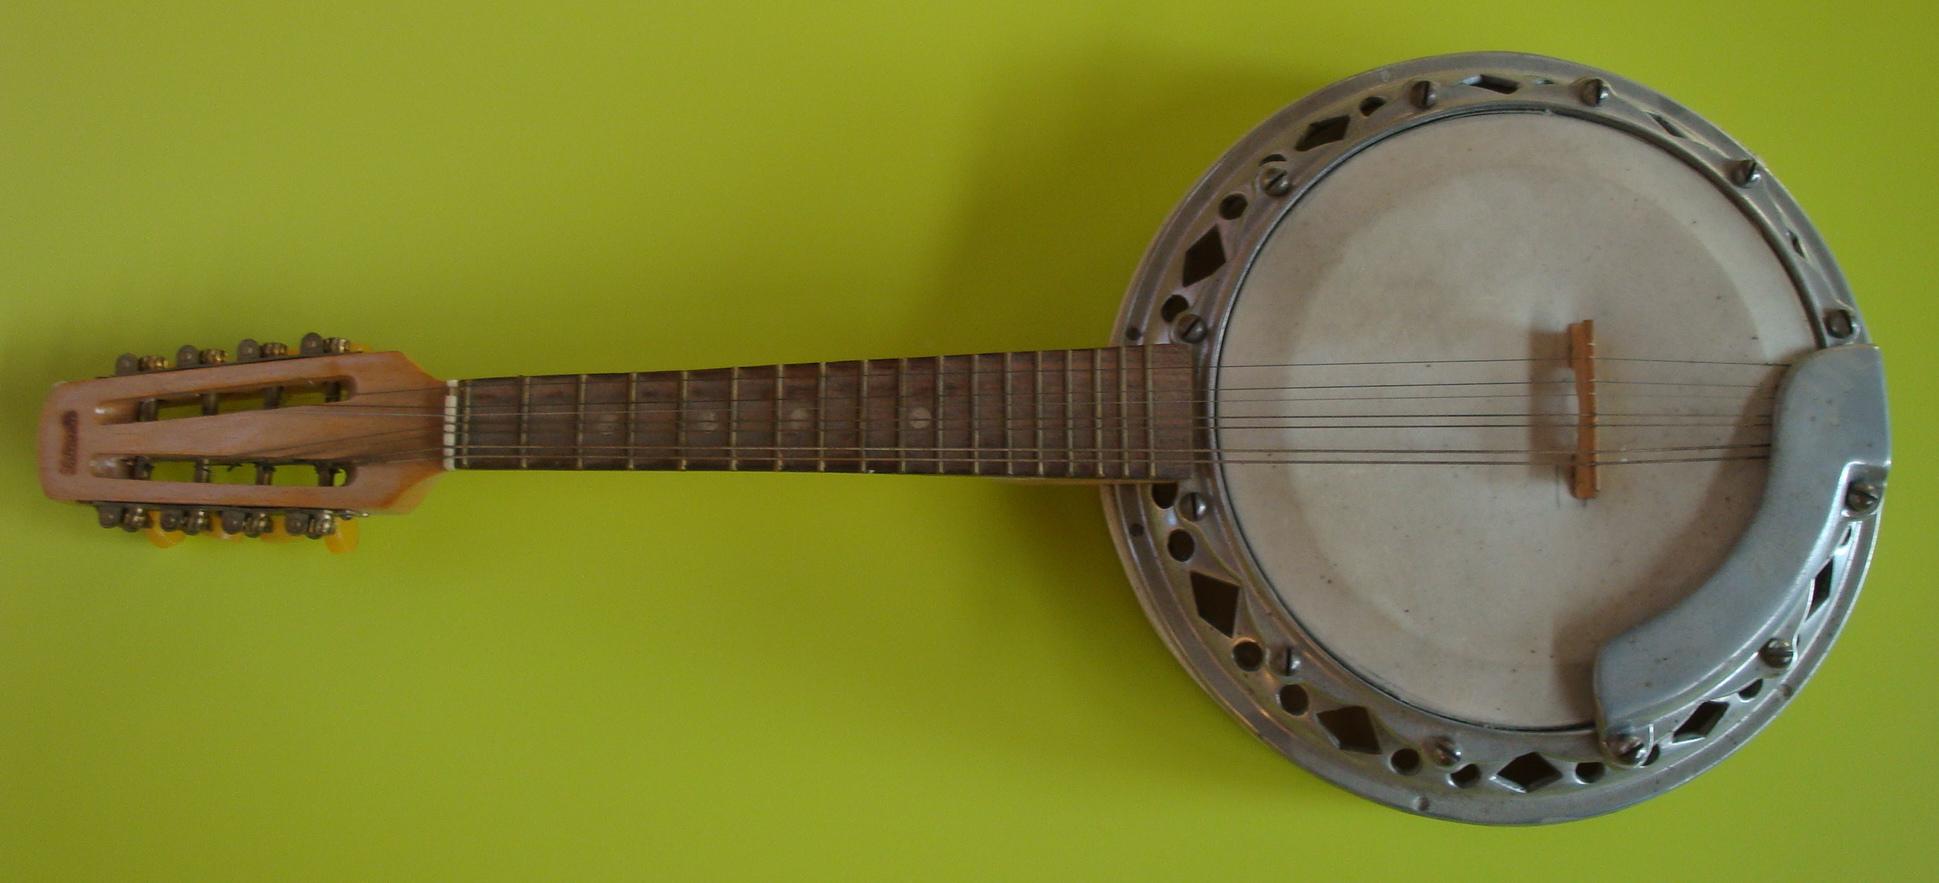 Instrument de musique Banjo